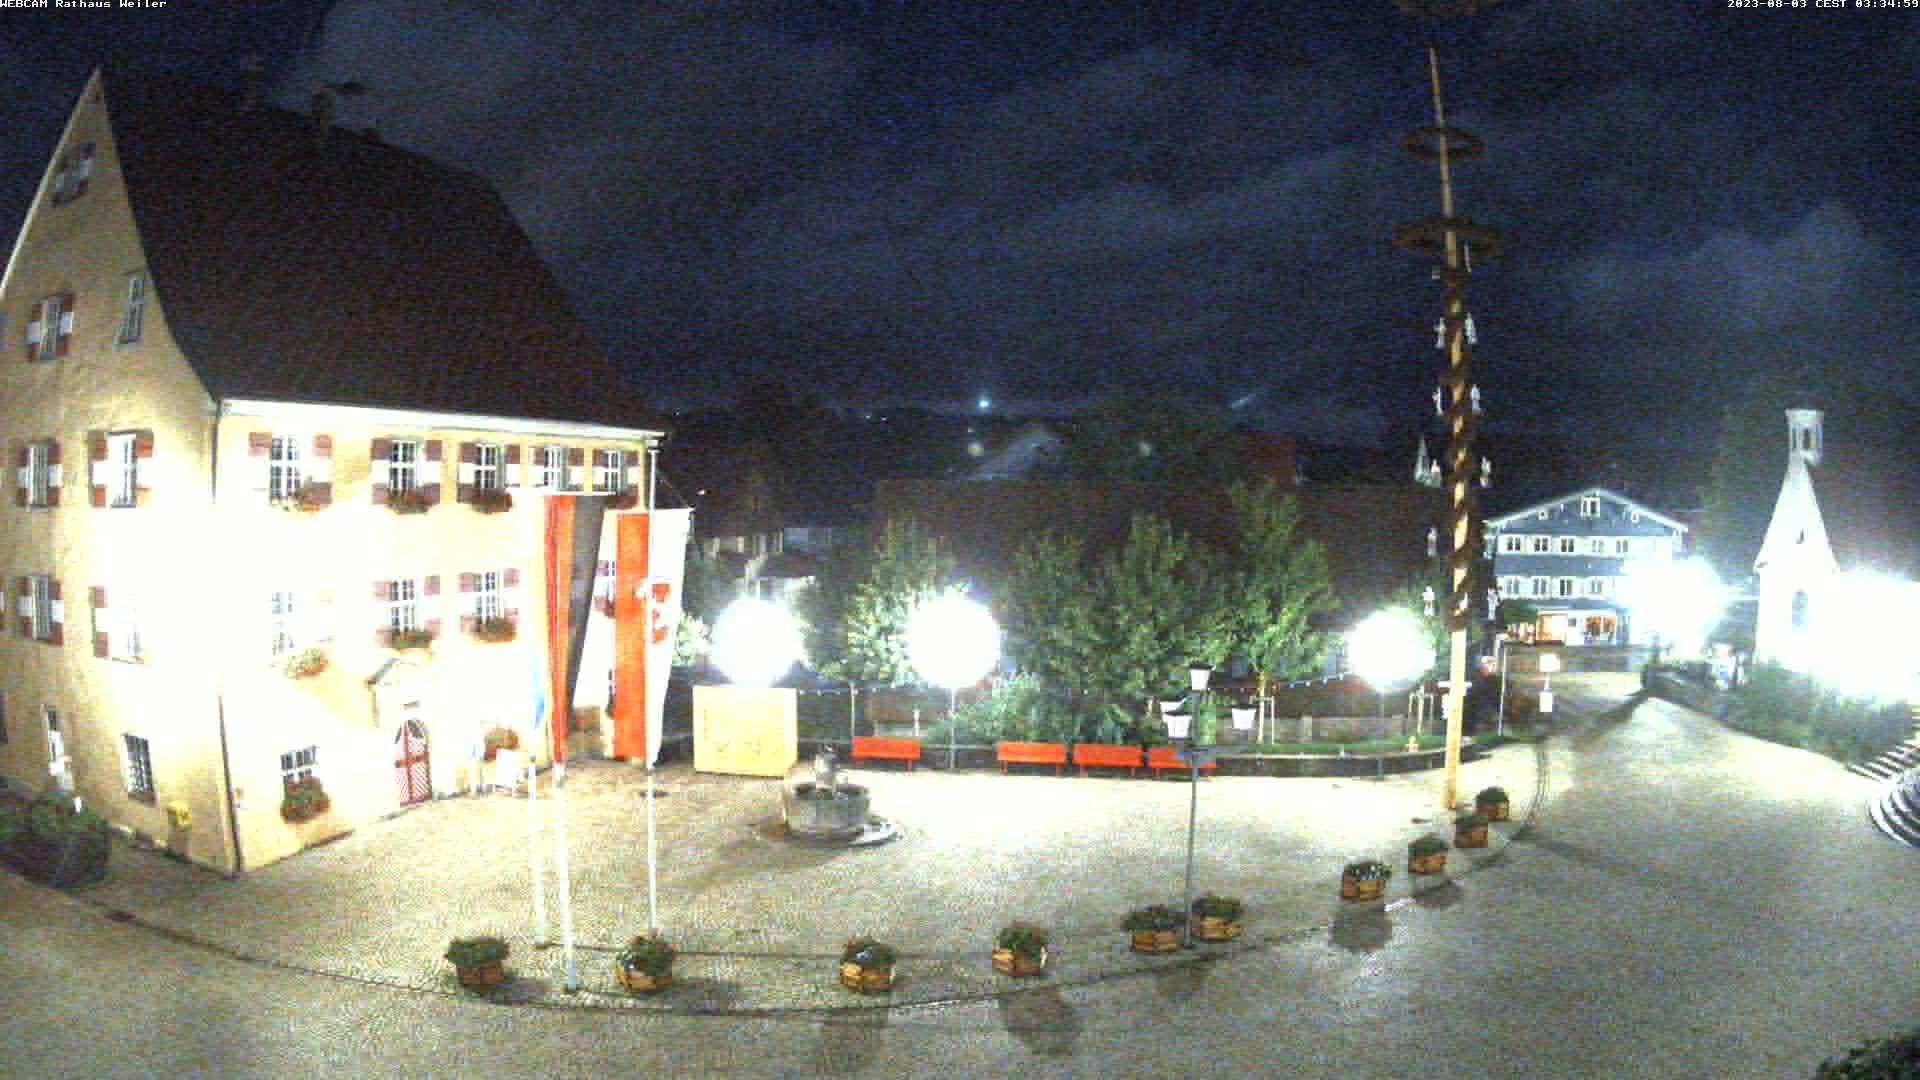 Webcam in Weiler-Simmerberg